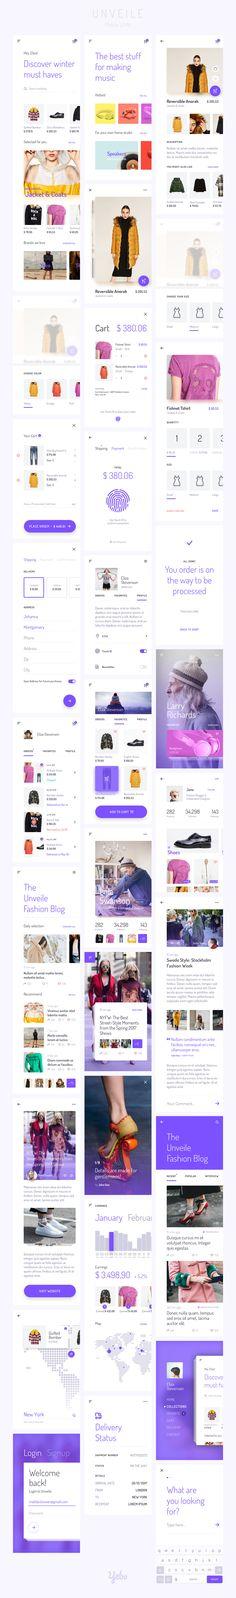 30 Screen E-Commerce, Articles, Social iOS UI Kit